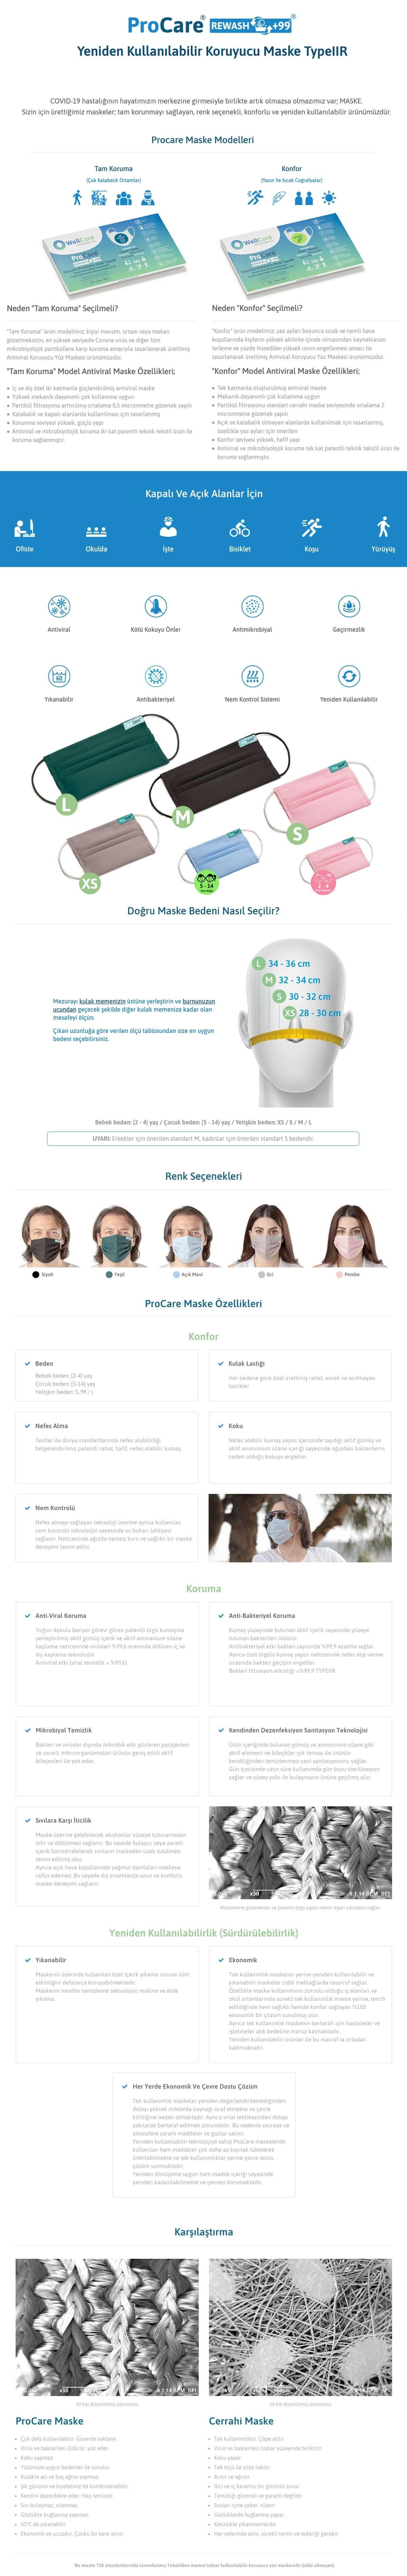 Procare Antiviral Yıkanabilir Maske Detay